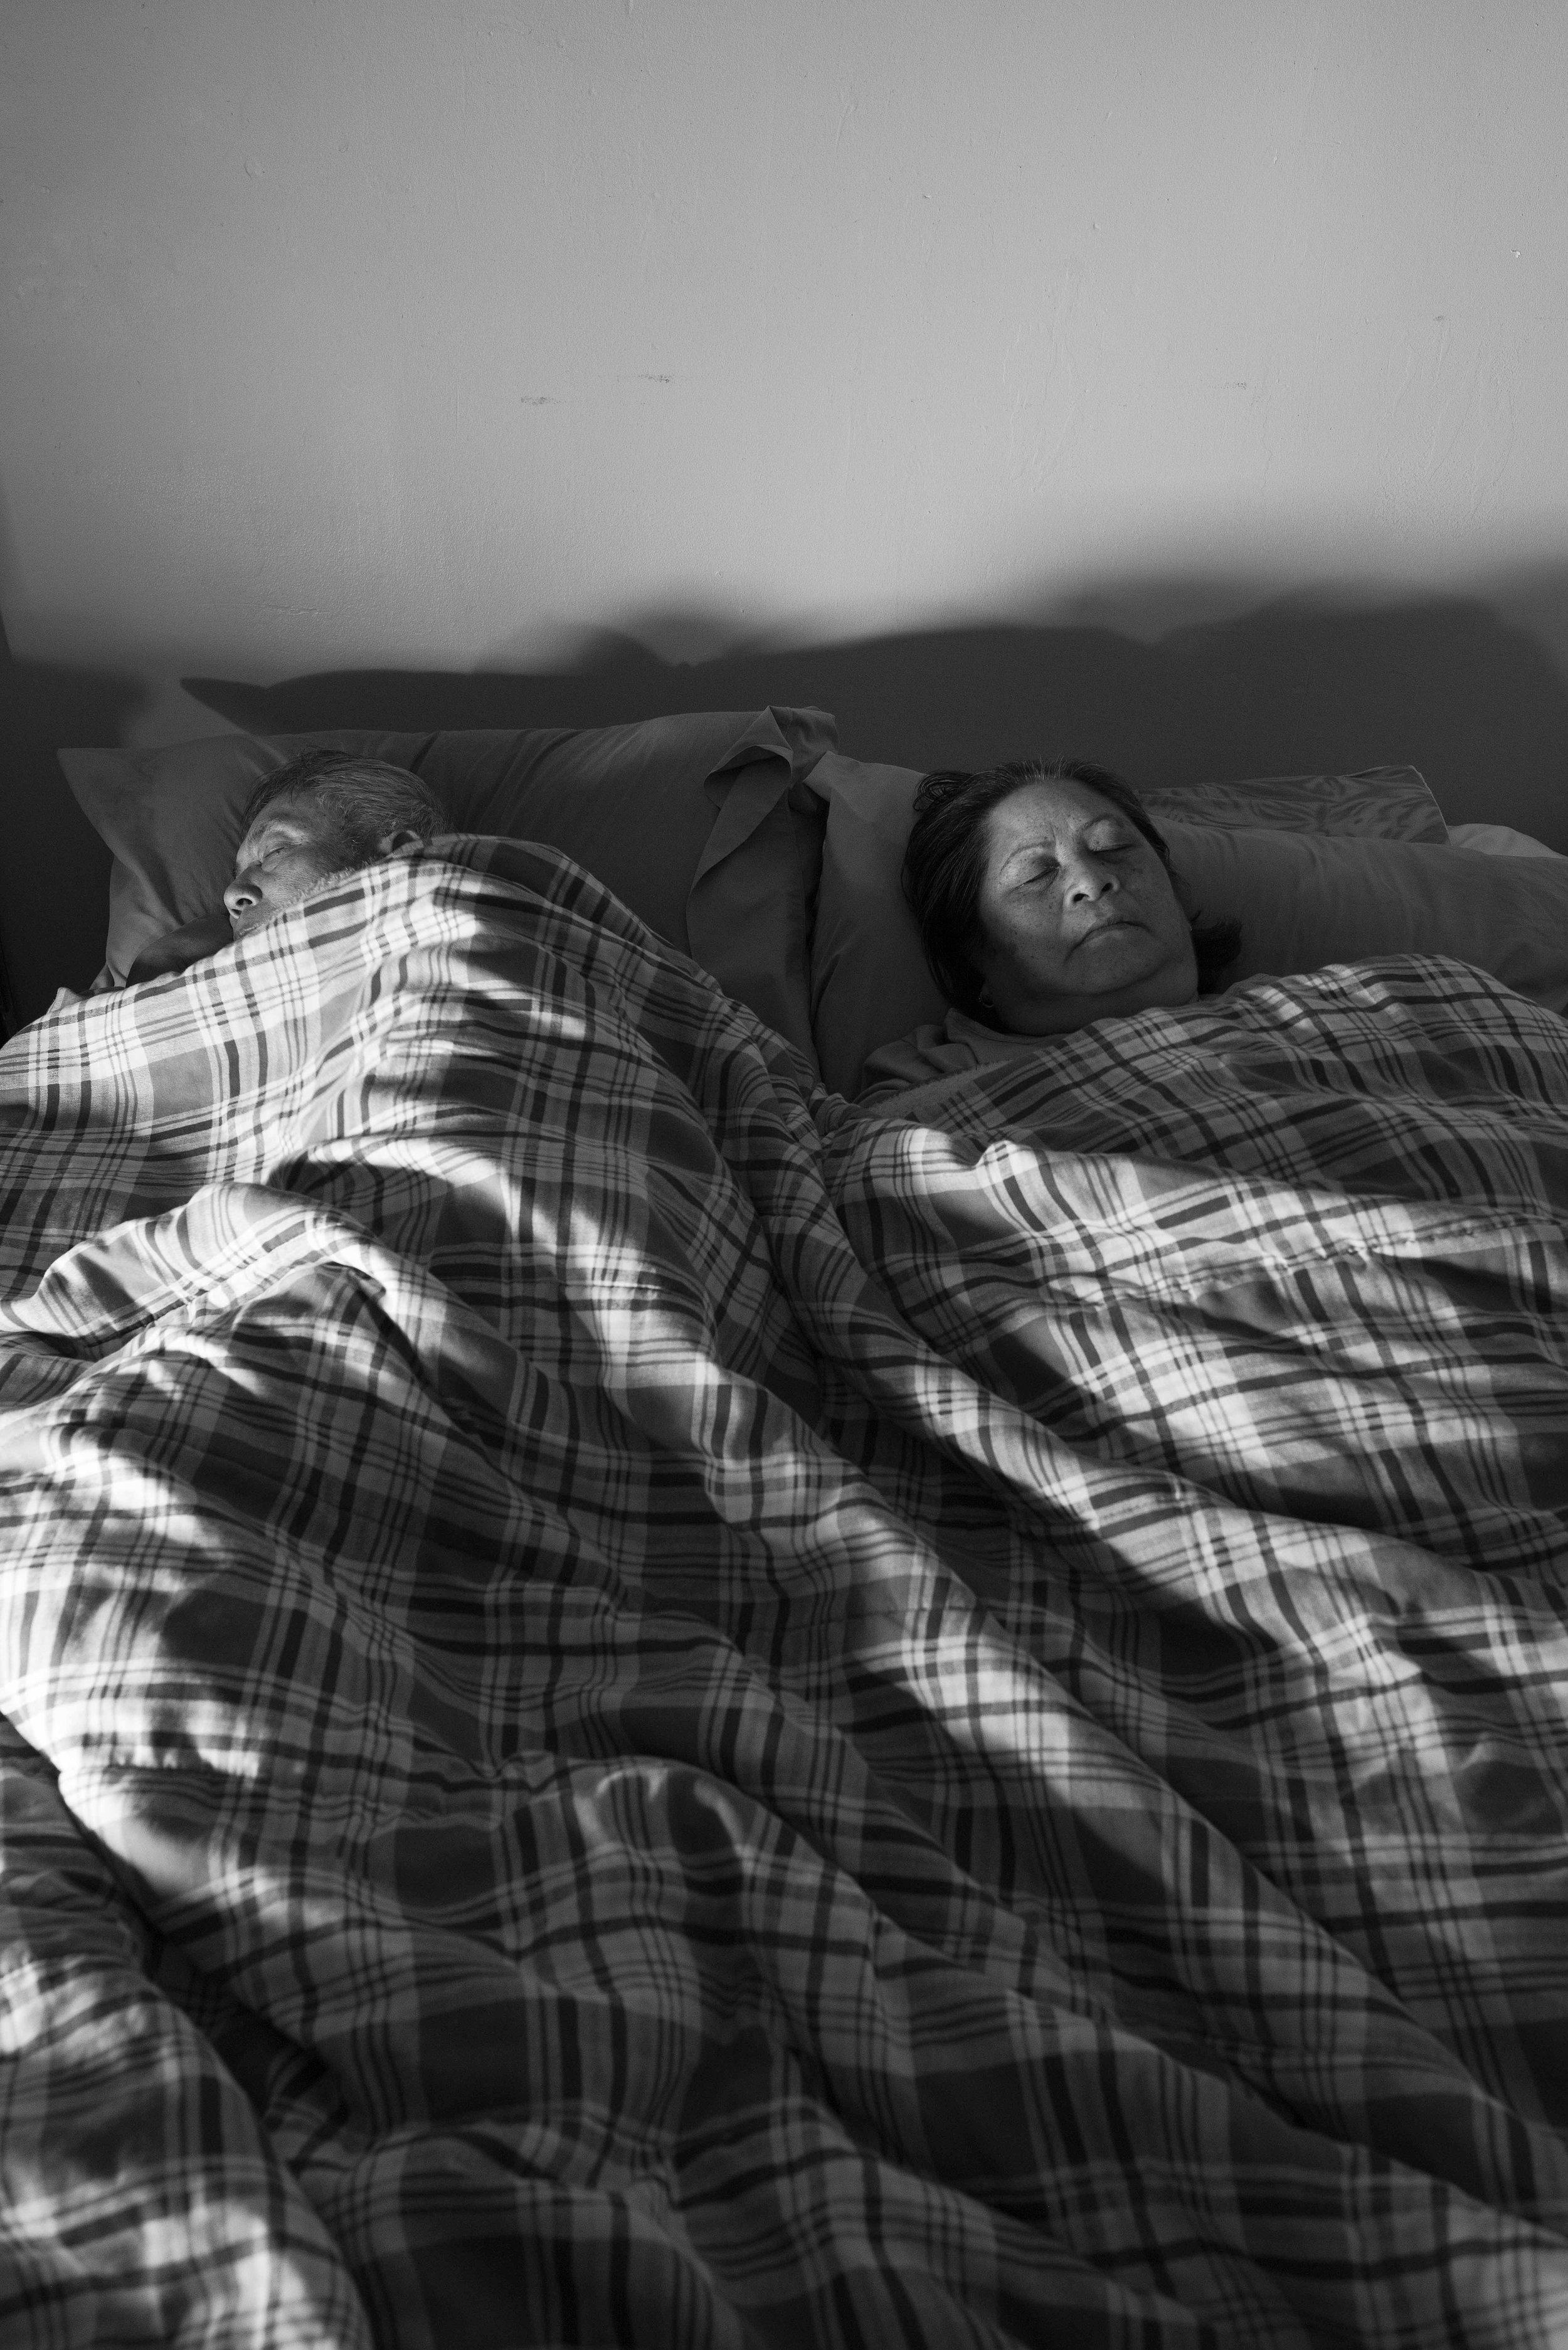 Sleeping Under the Horizon, 2018